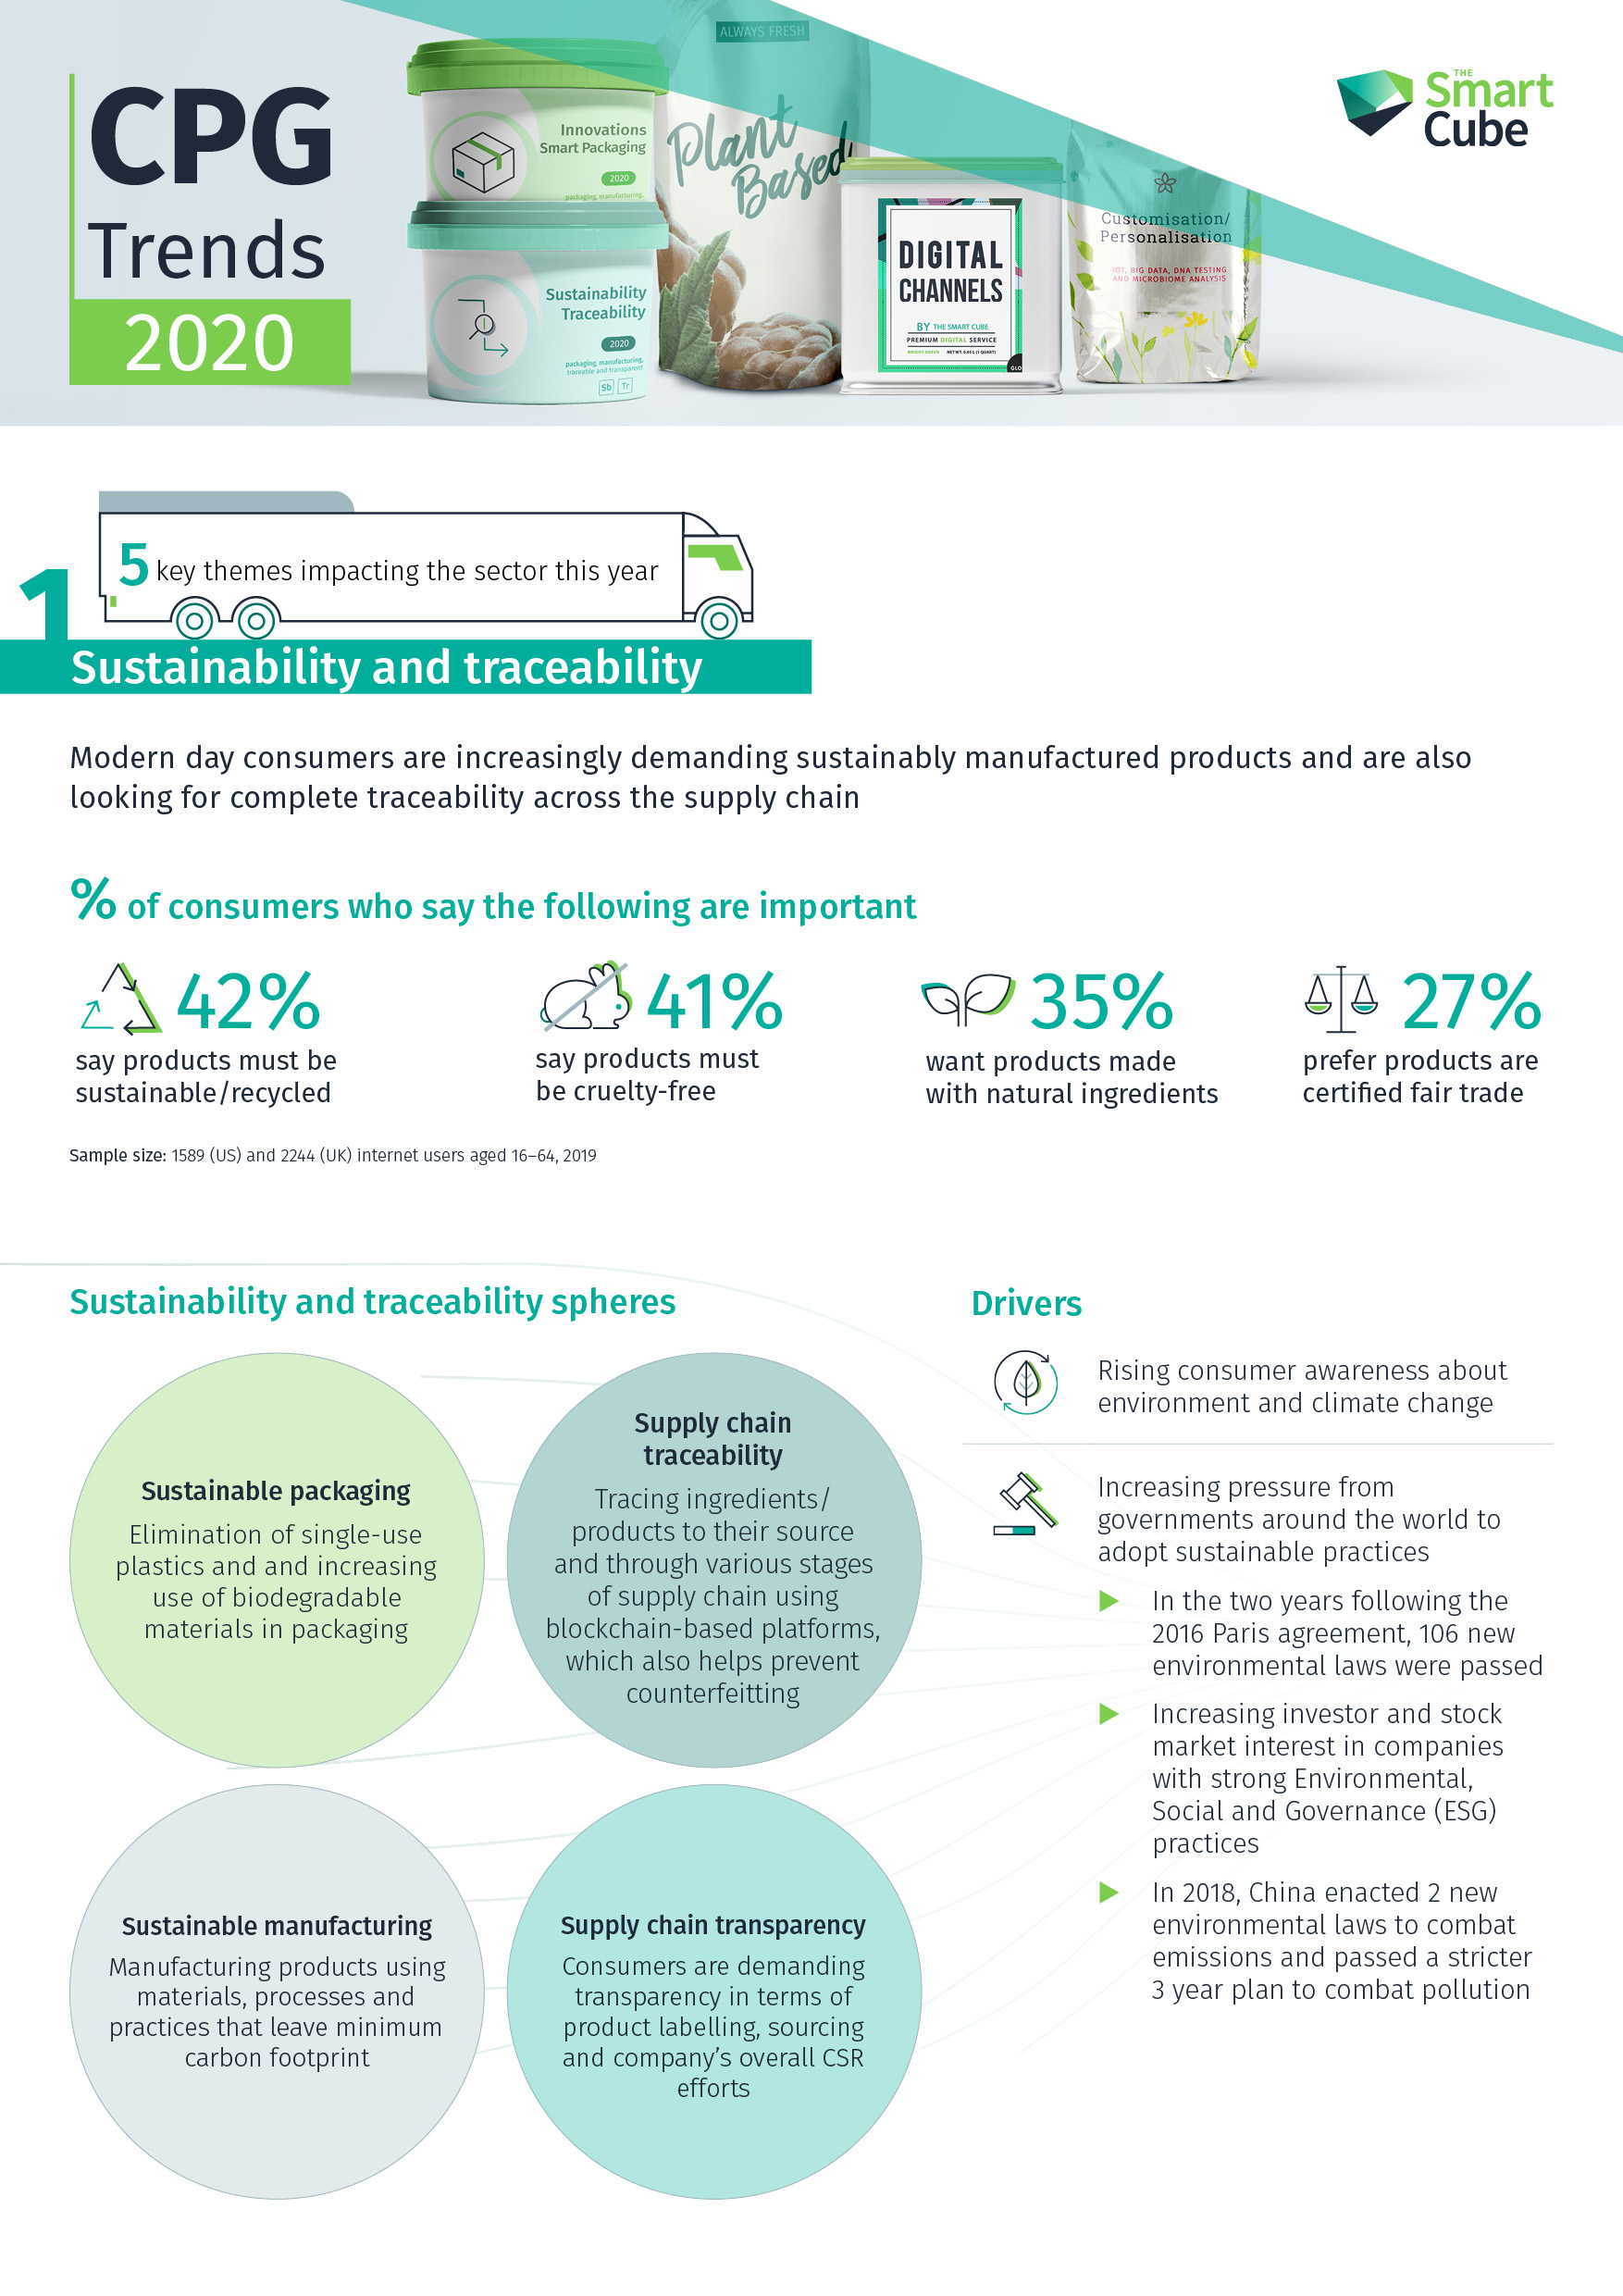 Infographic-CPG-2020-Themes-Hubspot-Thumbnail_2020-01-17